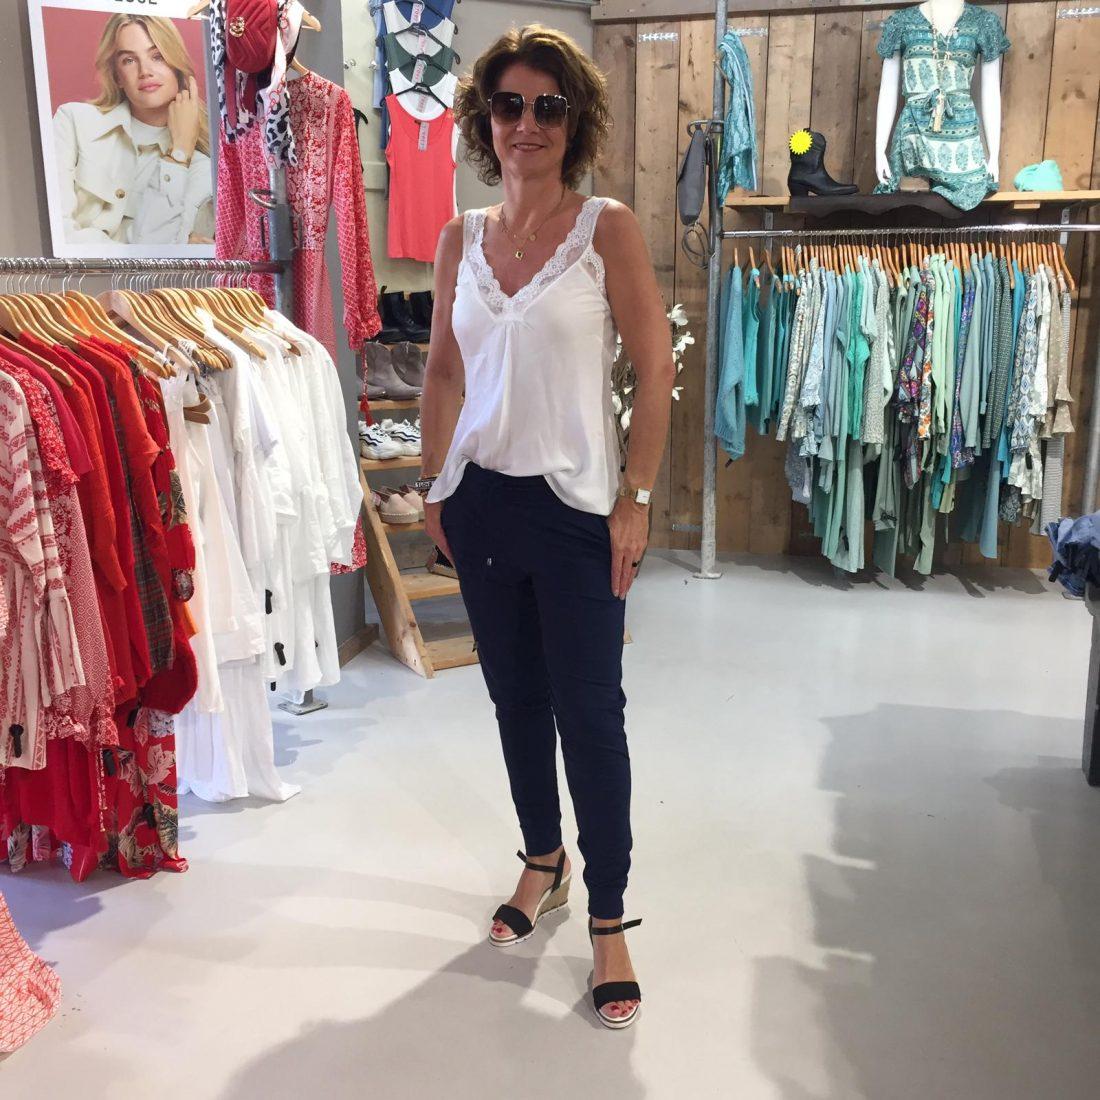 Vera Jo travelbroek Denisa Navy & Kanten Top Carina Wit